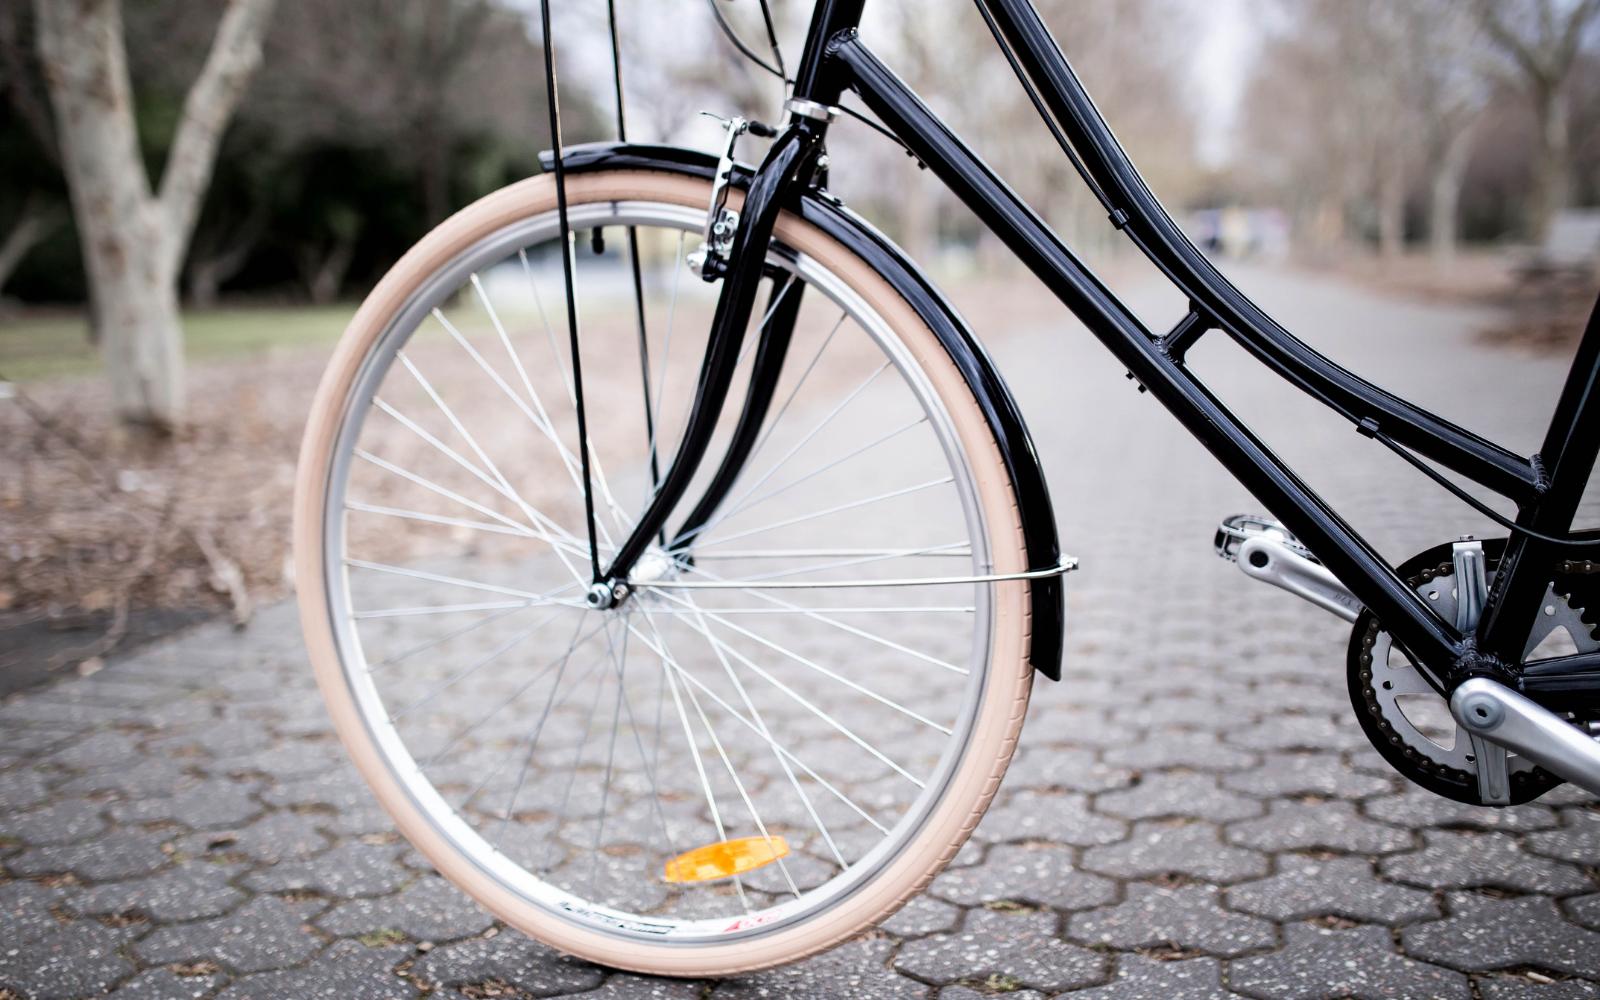 17 14 - Reid ® - Ladies Deluxe 3-Speed Bike